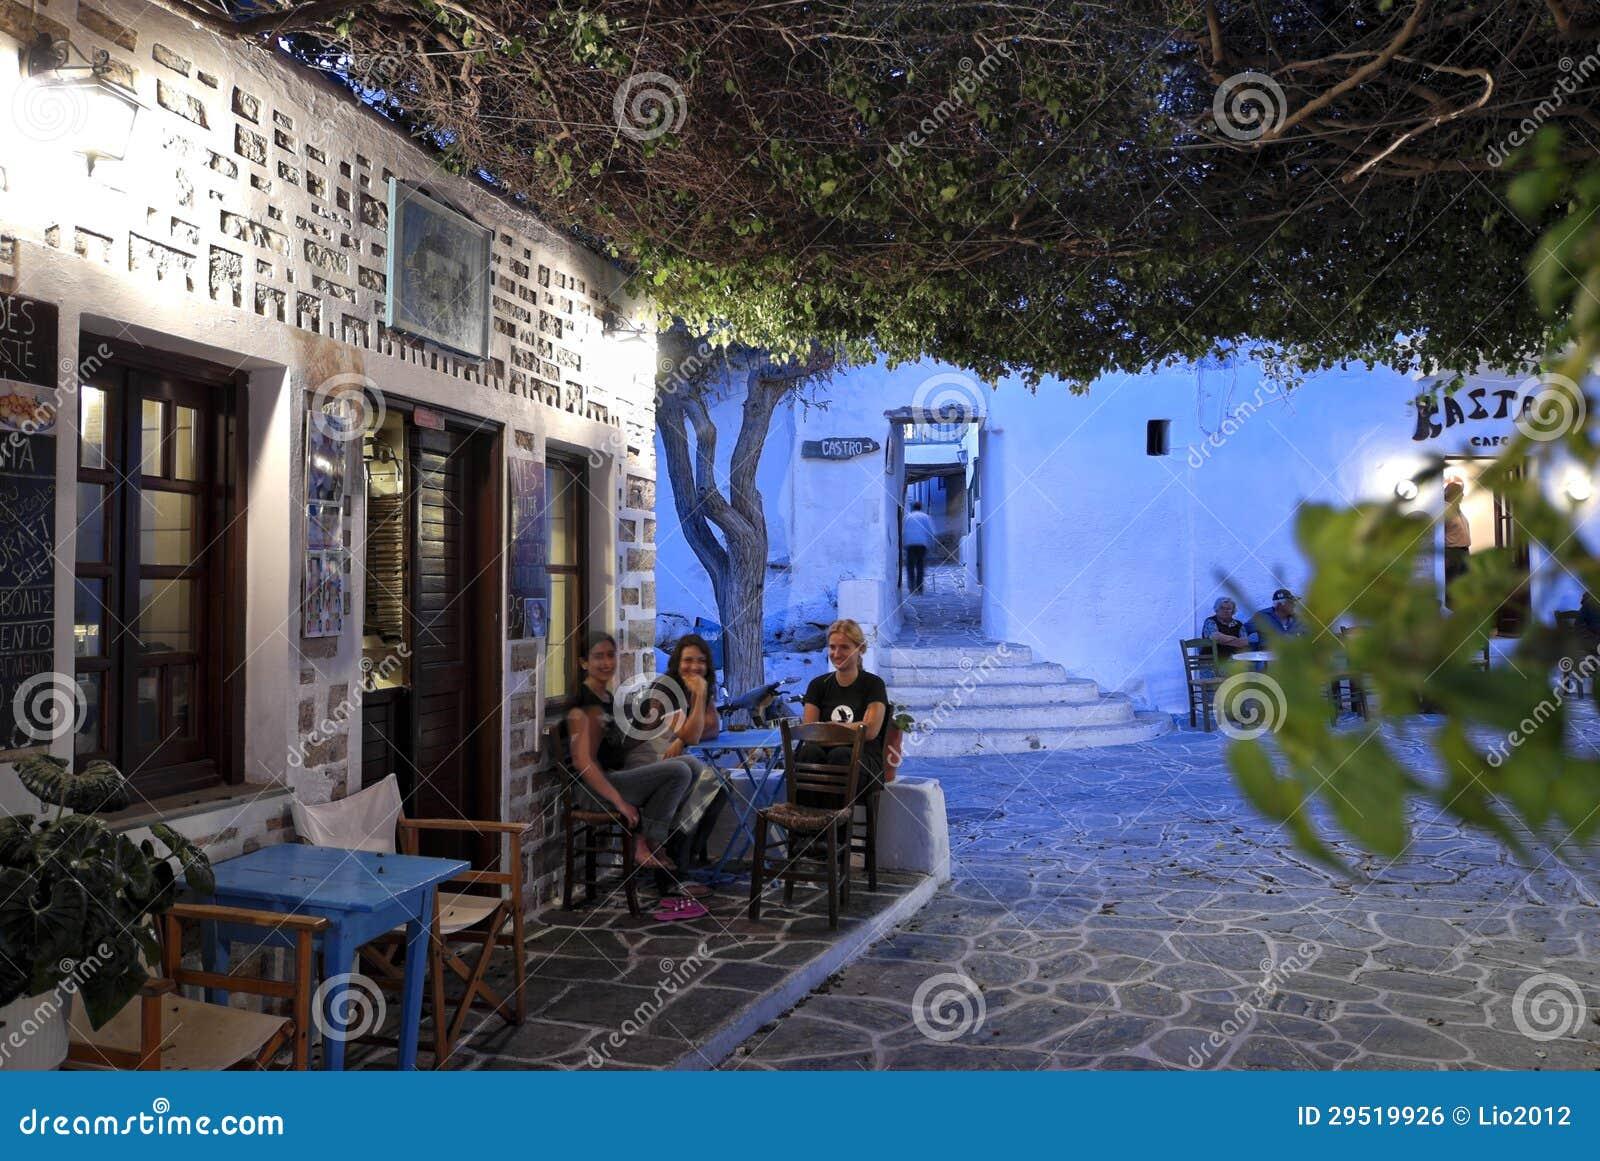 Nightlife In Folegandros, Greece Editorial Photo - Image ...